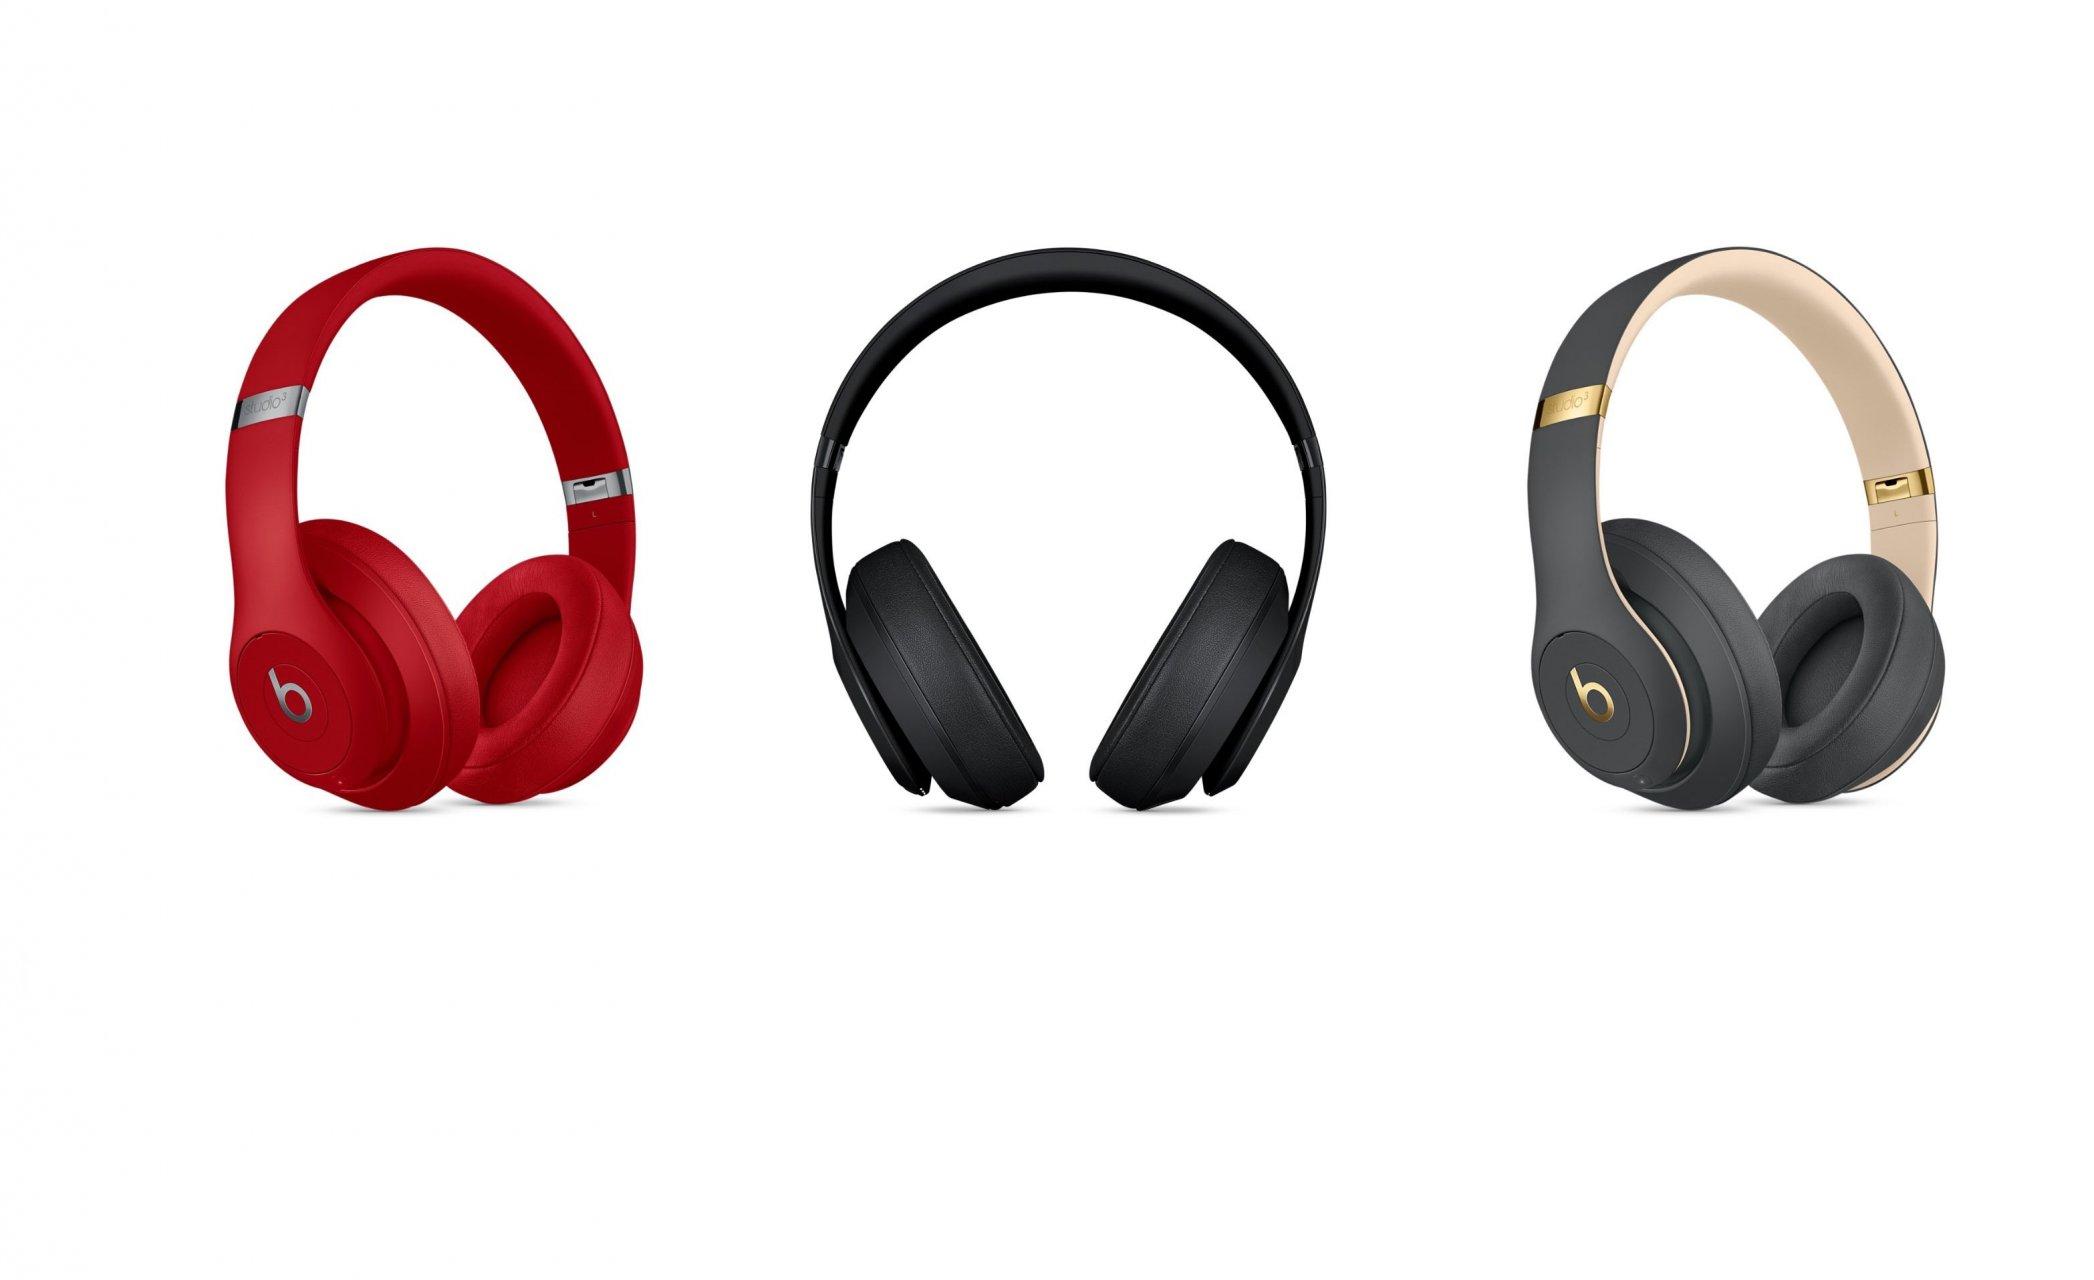 هدفون بی سیم بیتس Beats Studio3 Wireless Headphones